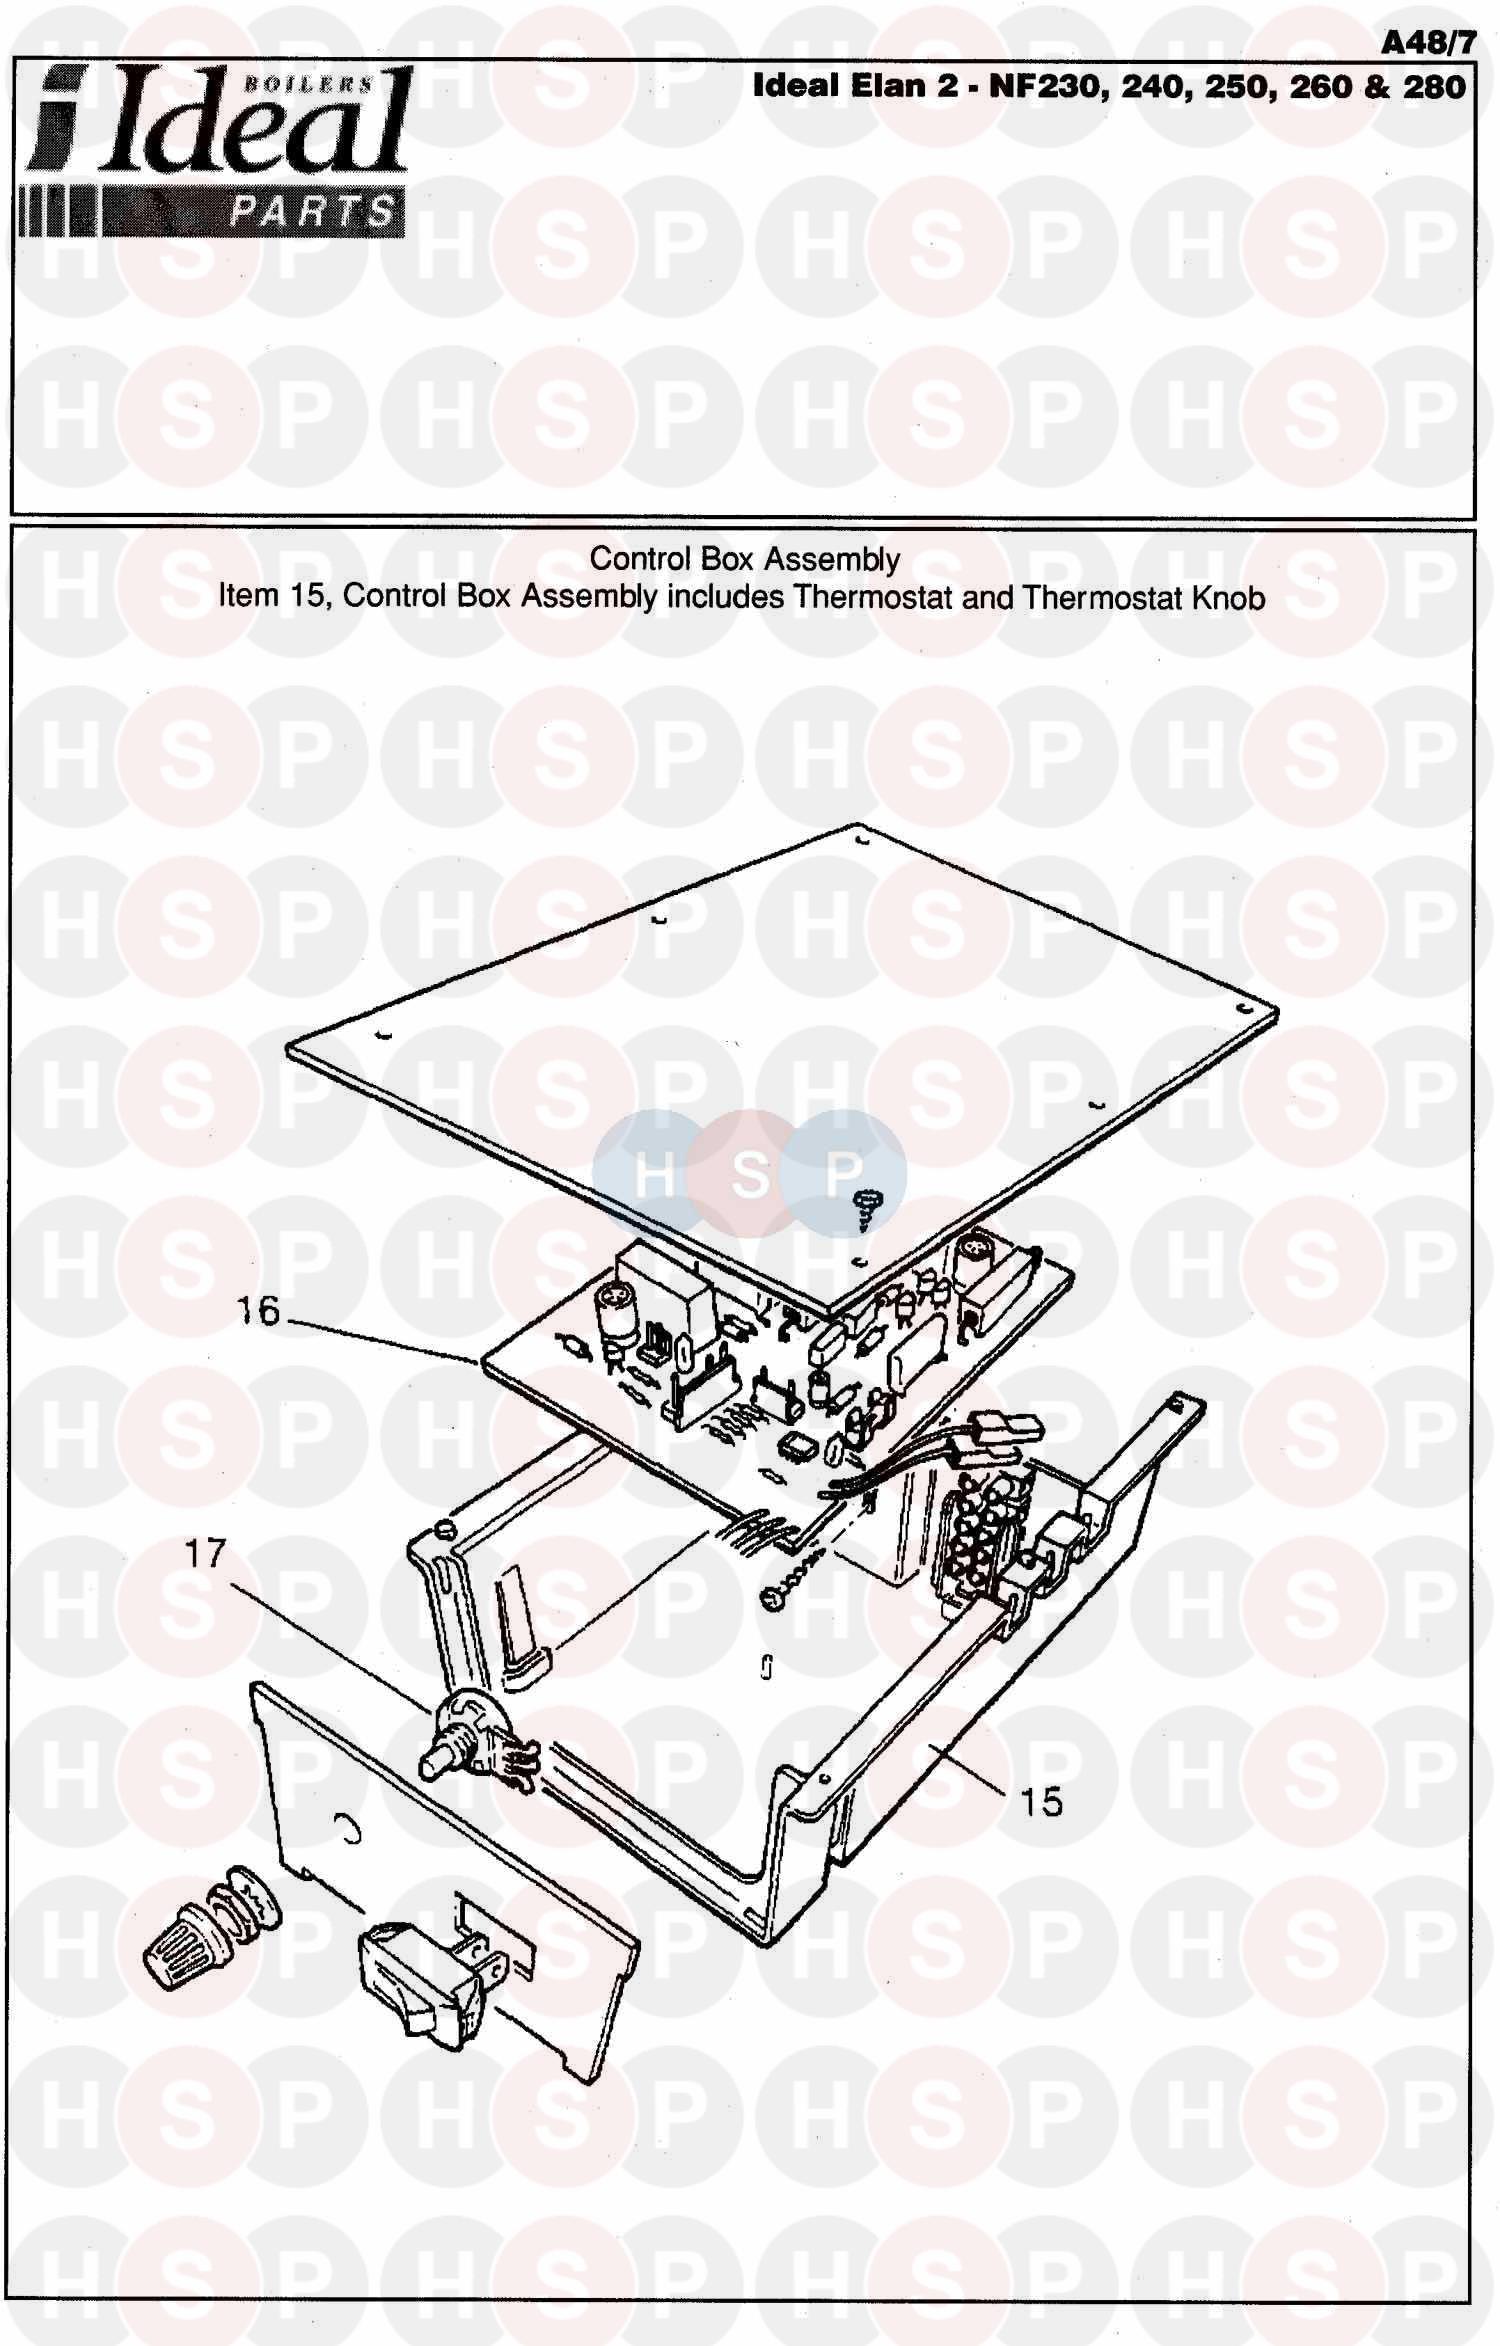 ideal elan 2 nf 250 appliance diagram  control box ass